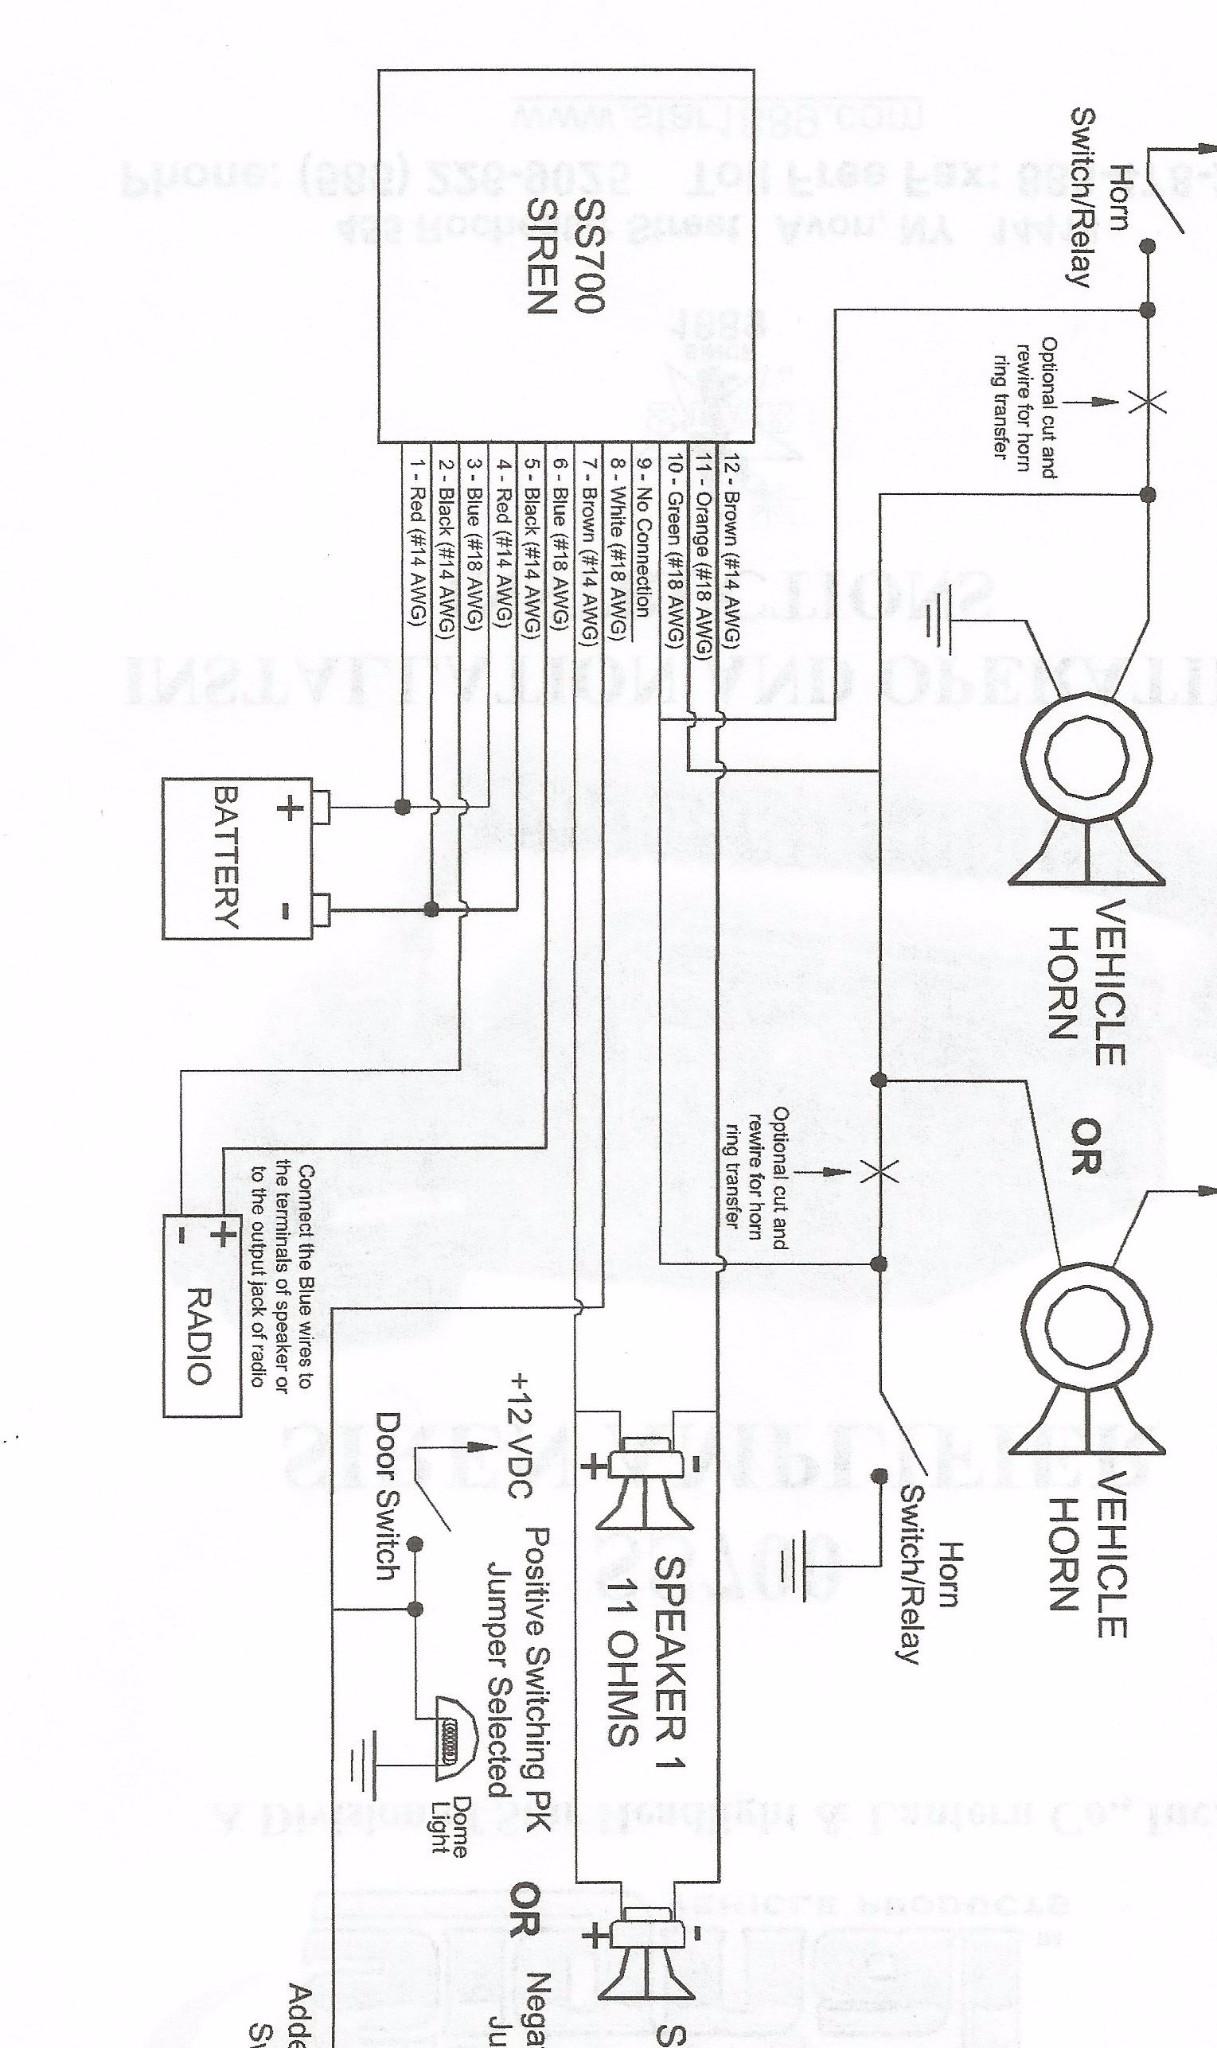 Diagram De Mega Siren Wiring Diagram Full Version Hd Quality Wiring Diagram Diagramgoetzi Gotoscana It